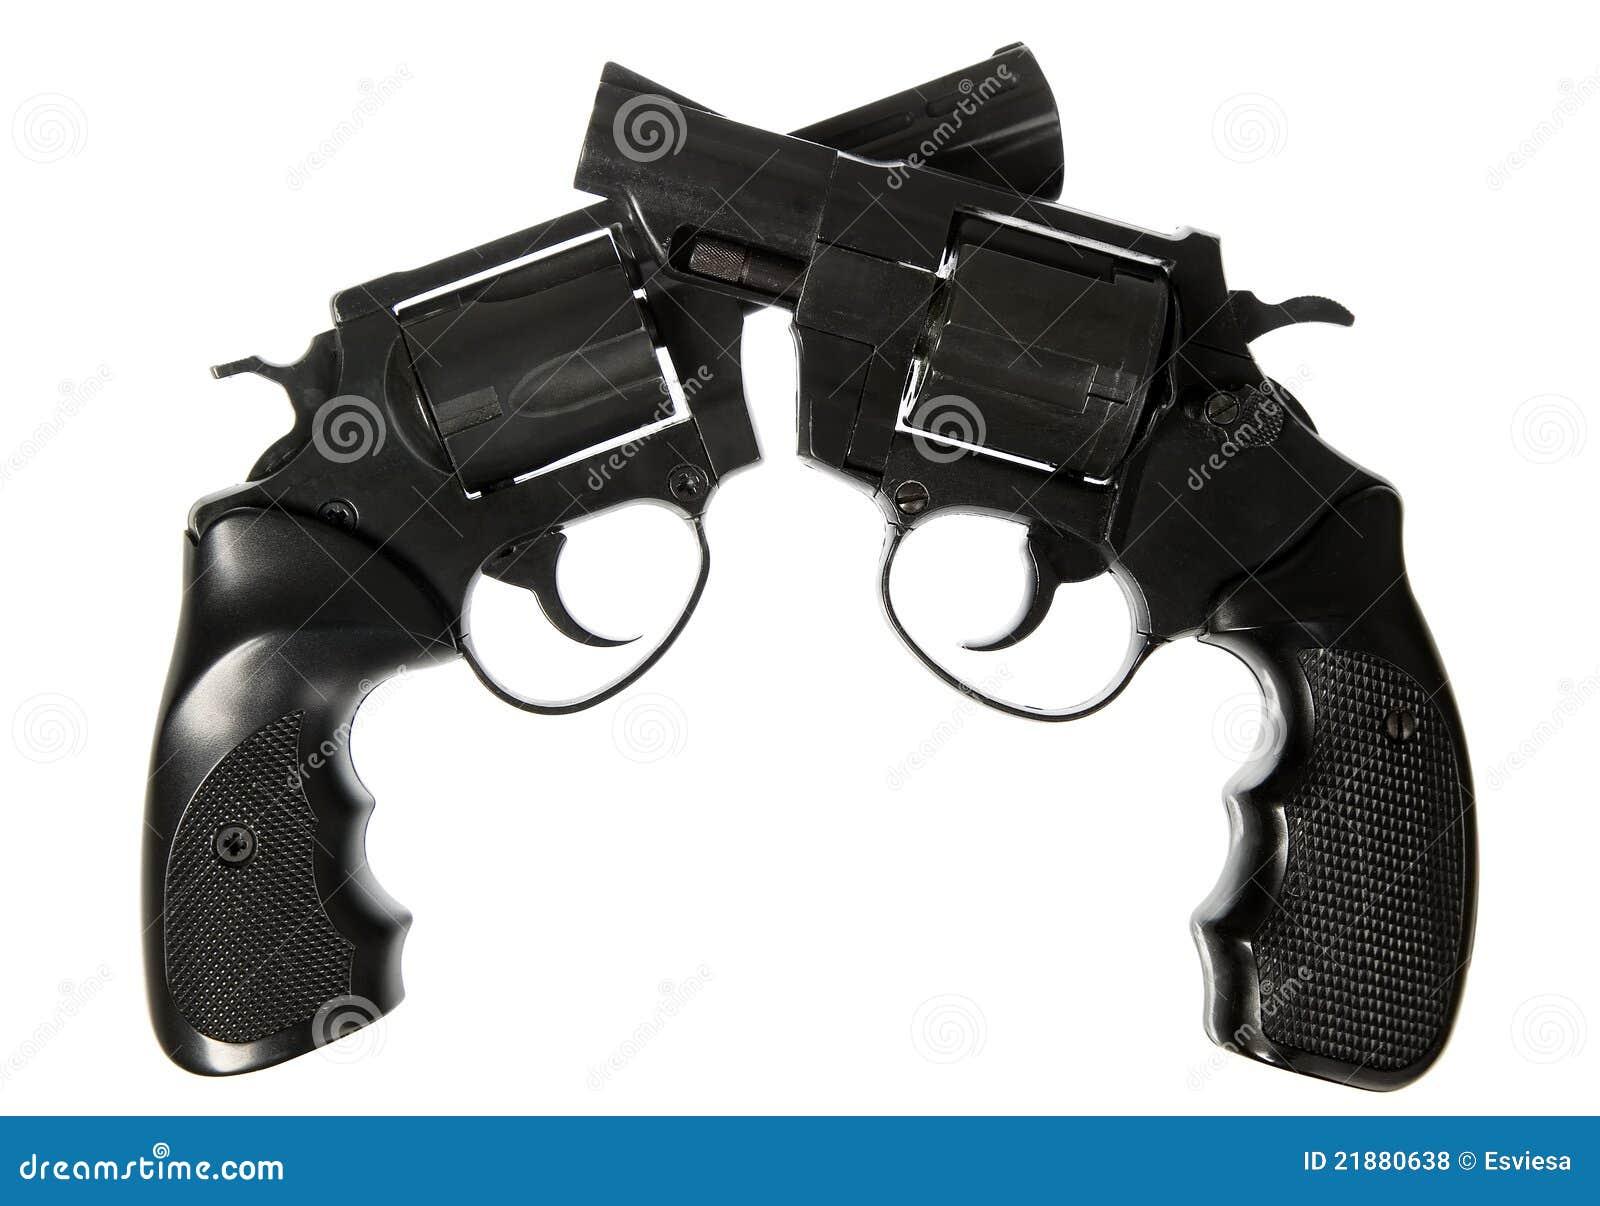 gun white background - photo #34